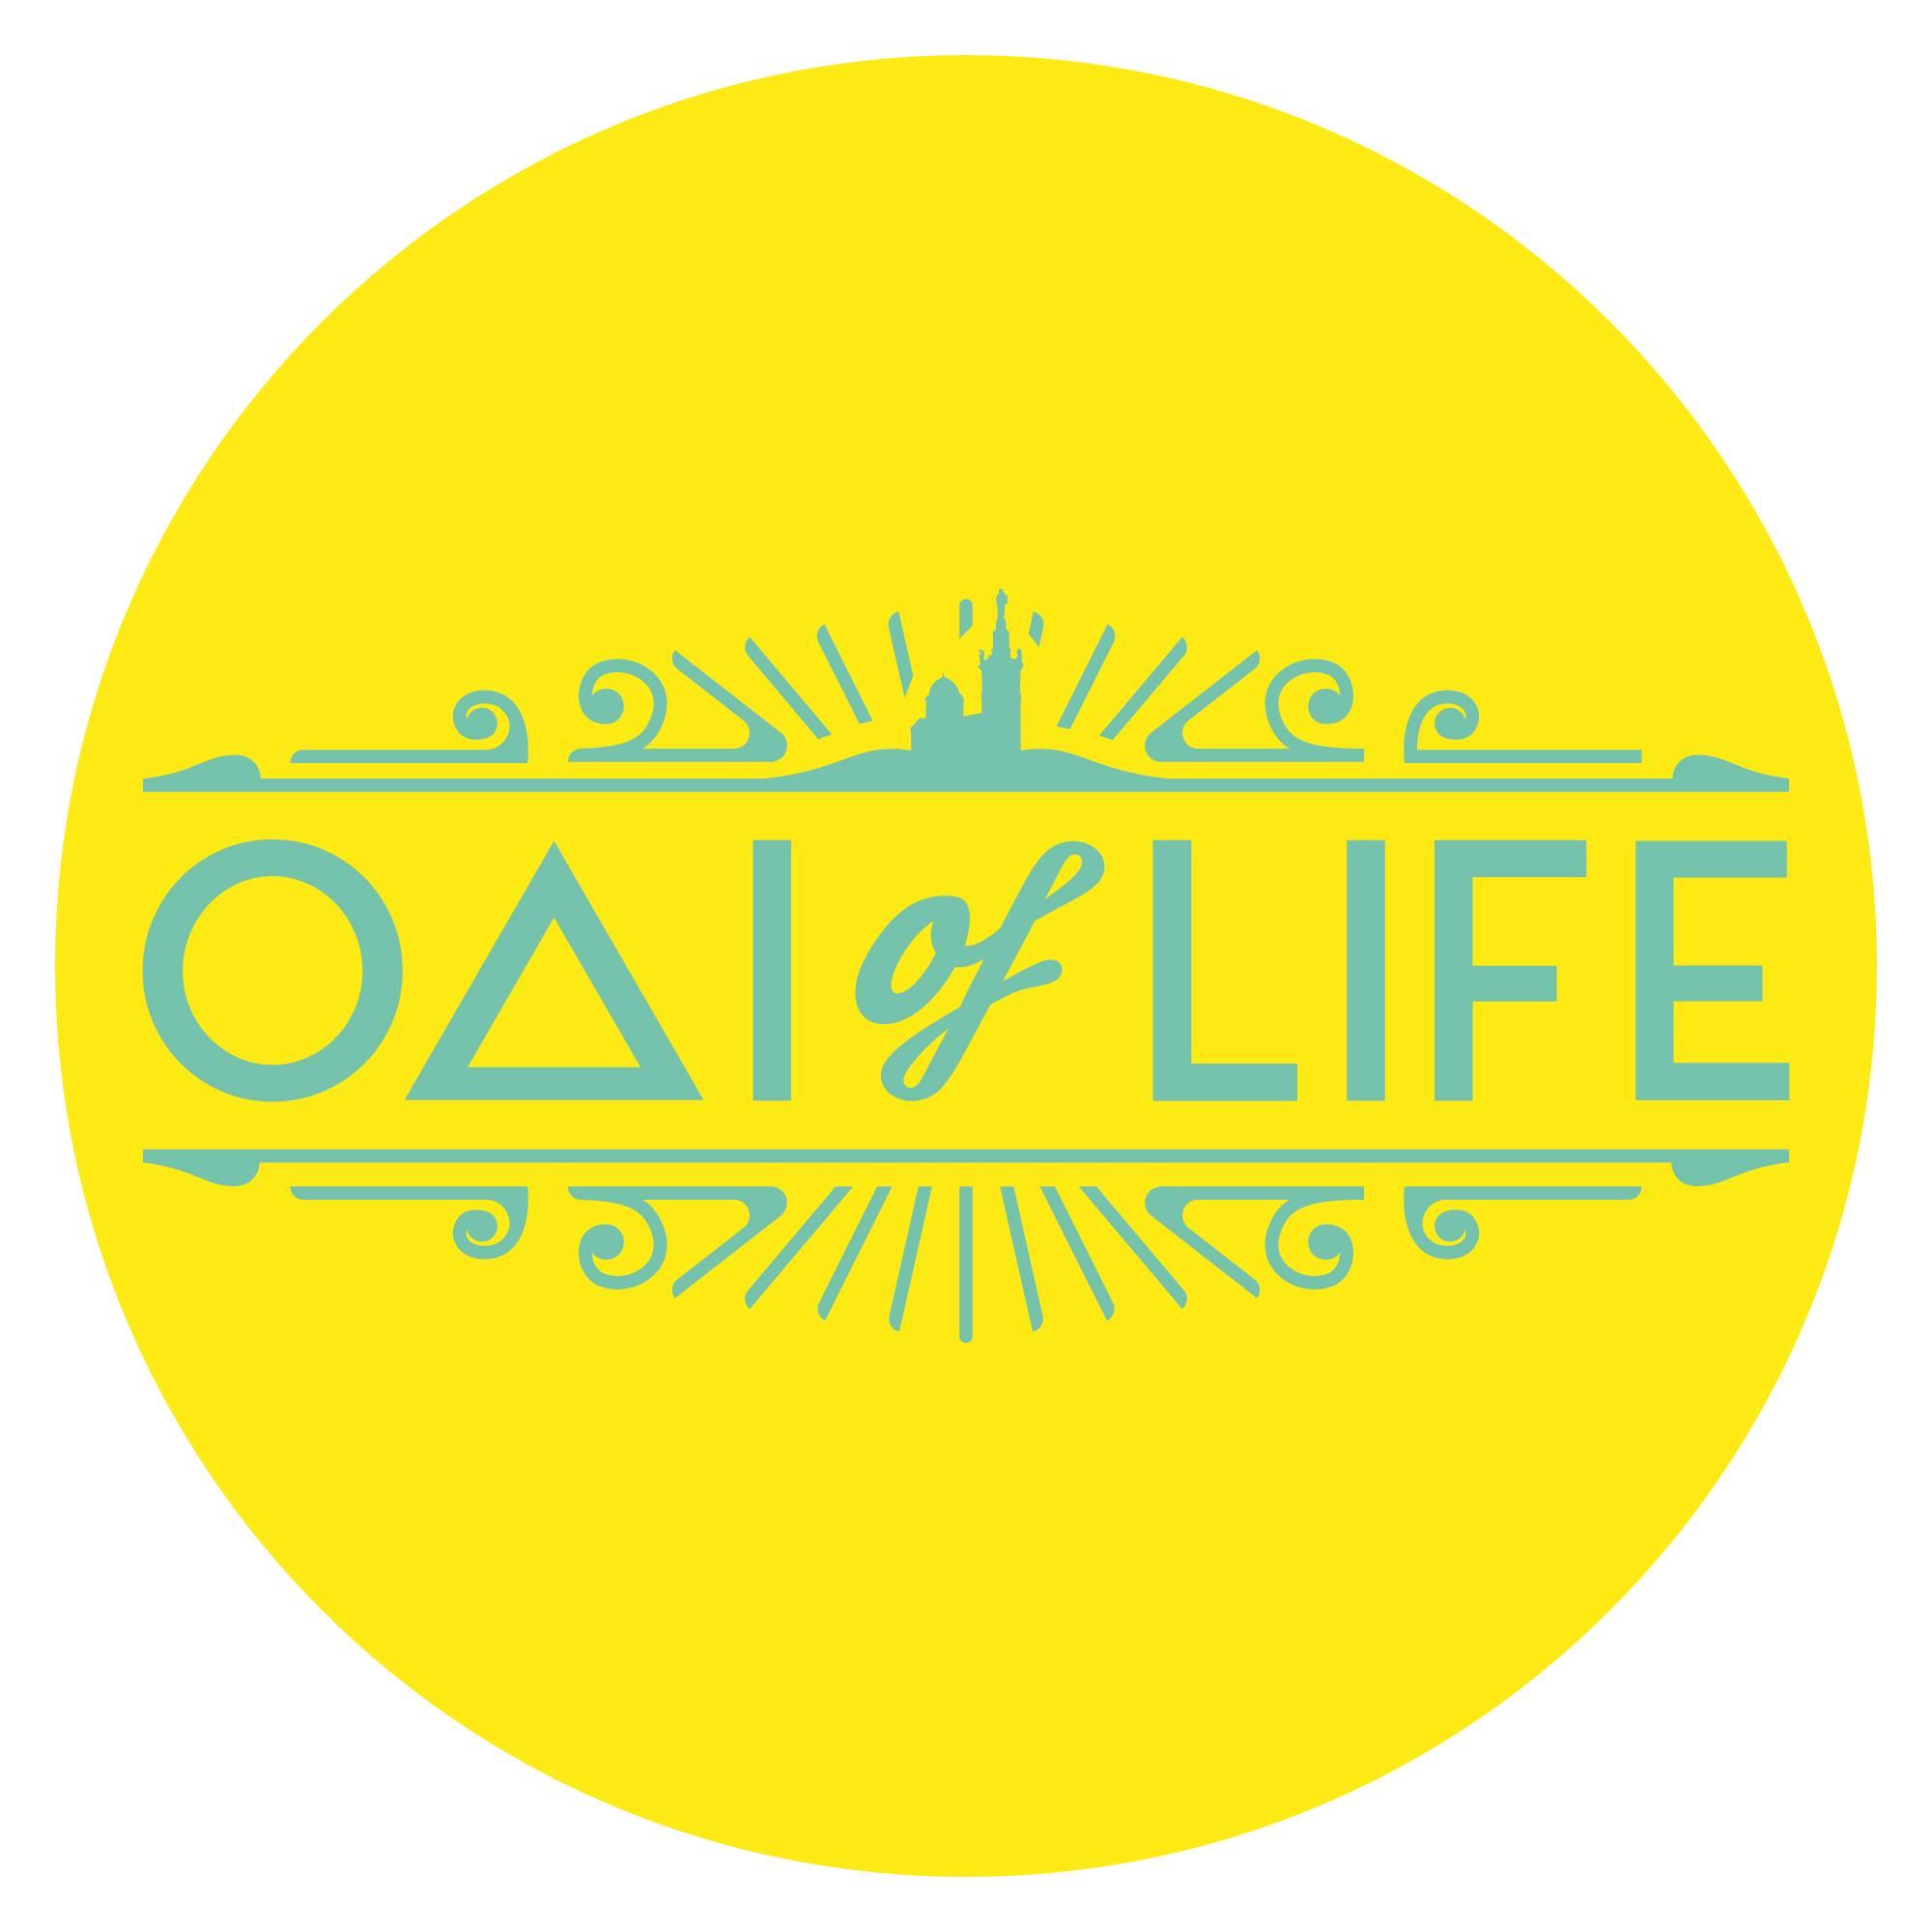 Oaï of Life